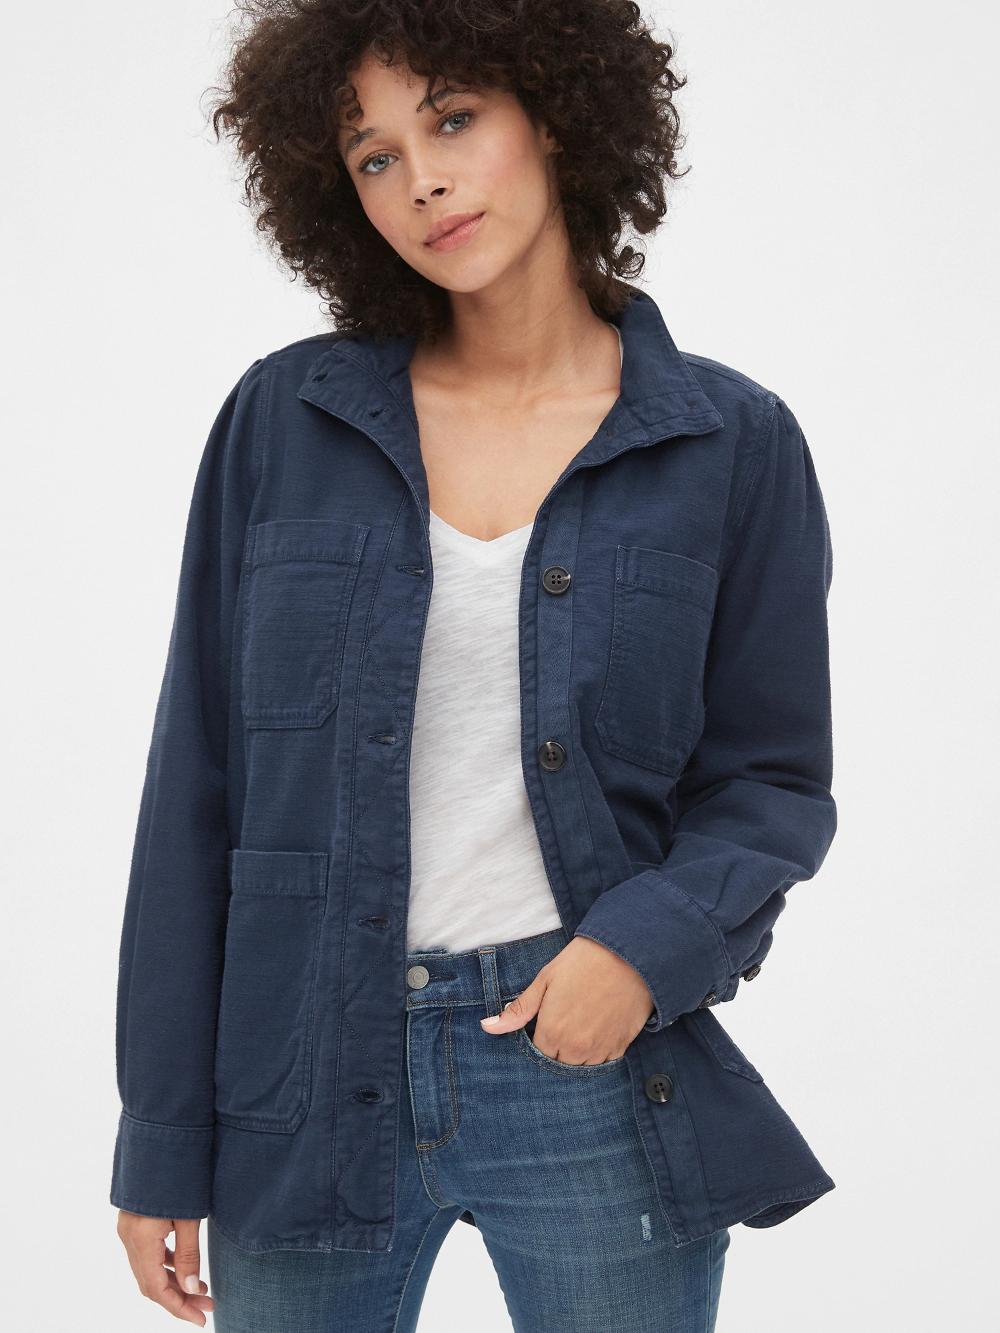 Slub Utility Jacket Gap Coats Jackets Women Jackets Stylish Outerwear [ 1333 x 1000 Pixel ]